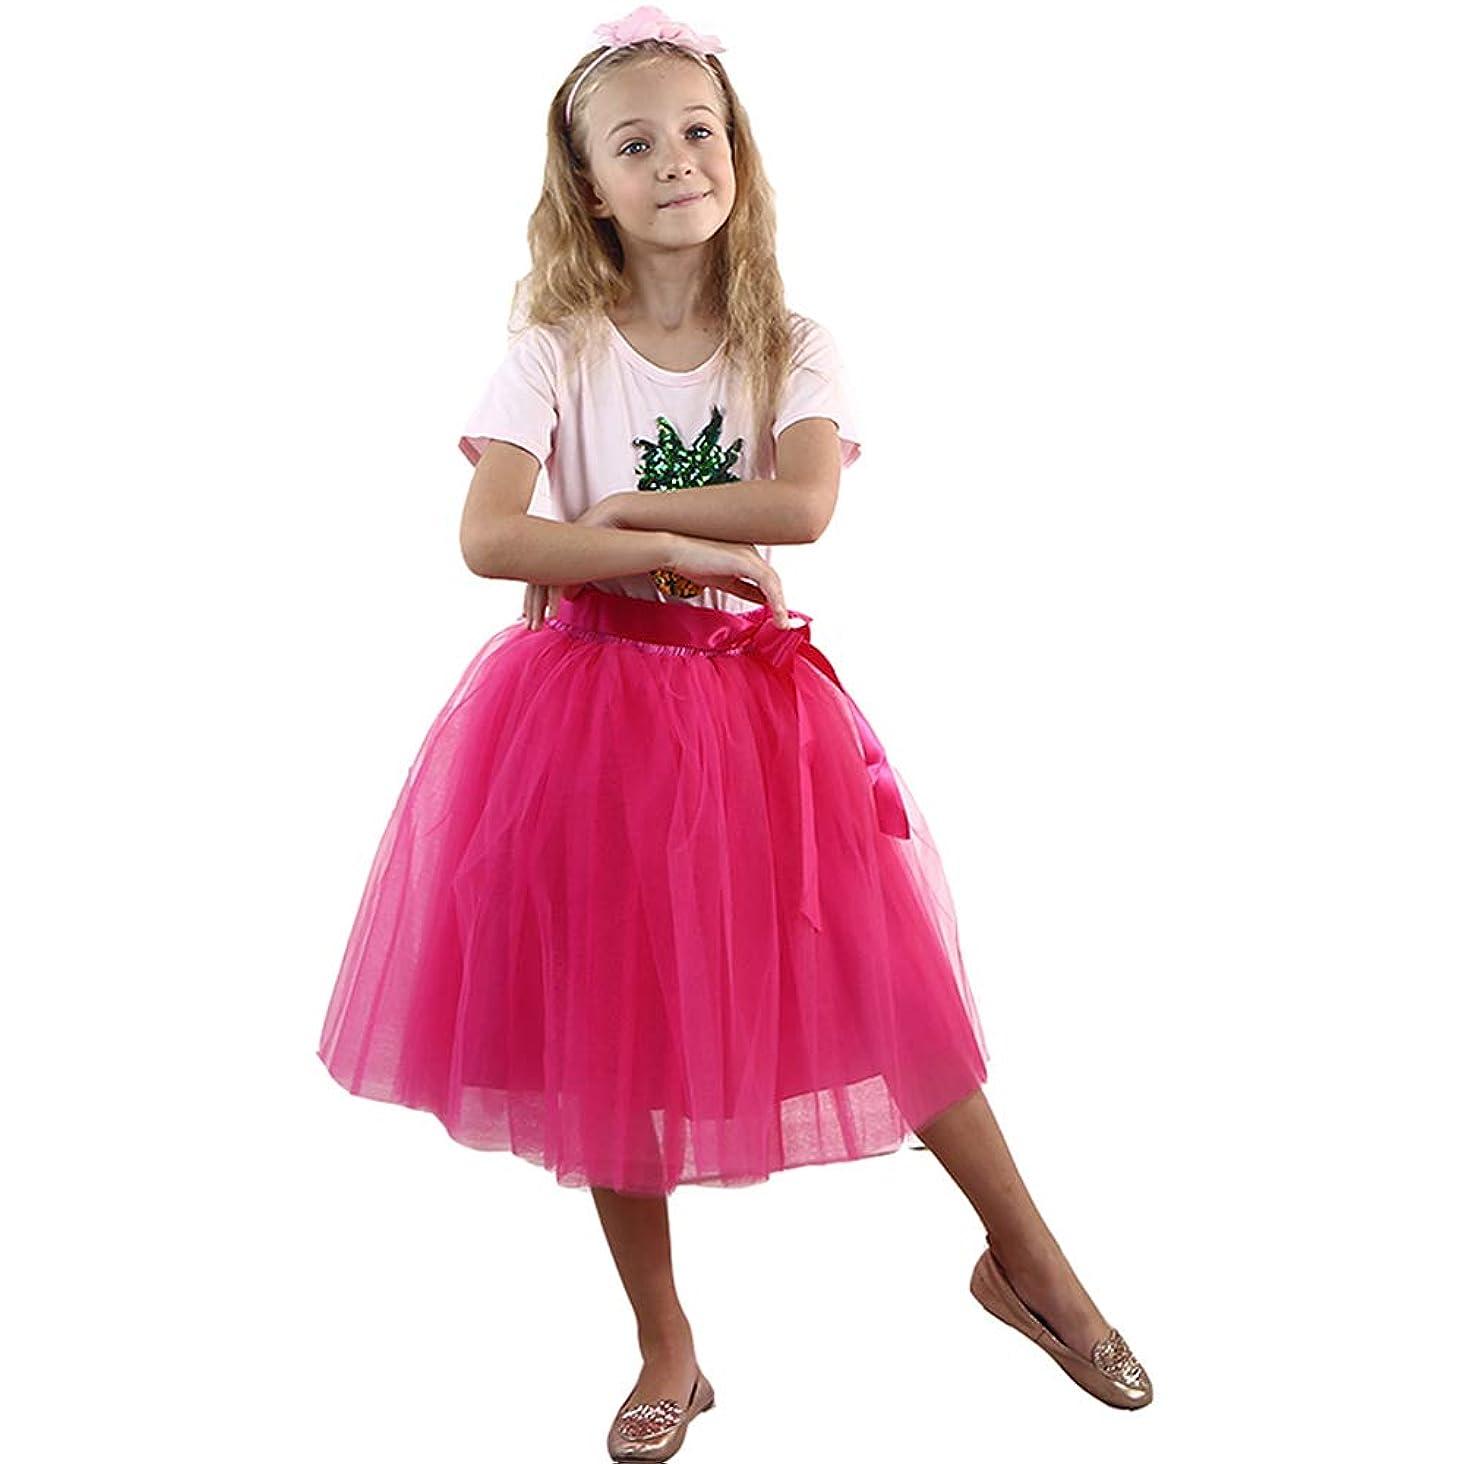 Zcaynger Girls Skirt Tutu Dancing Dress 5-Layer Fluffy with Ribbon